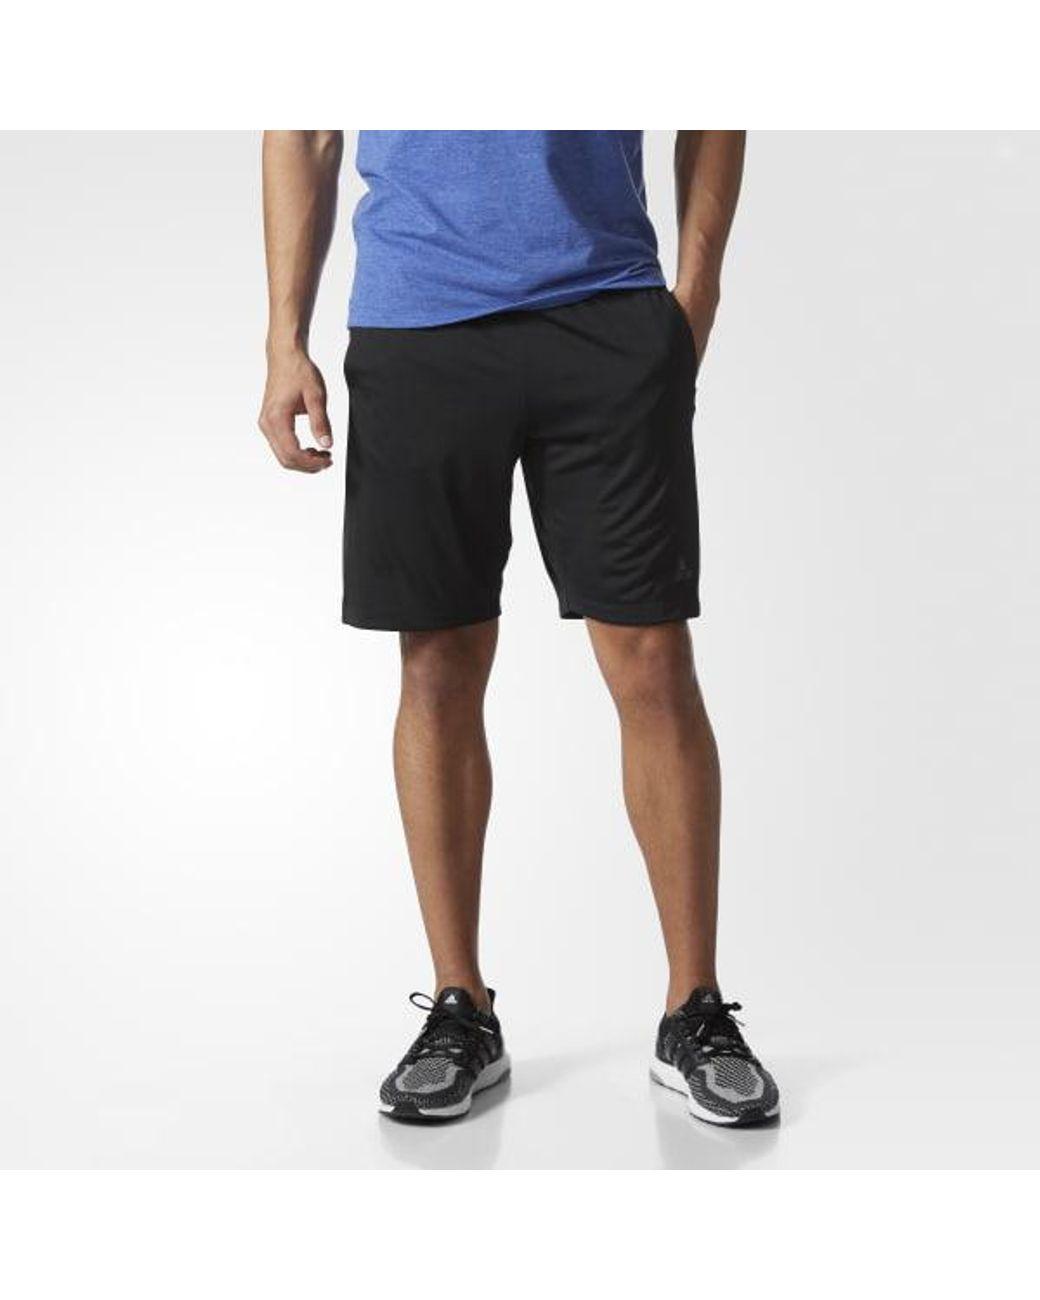 Adidas Mens Utility Short